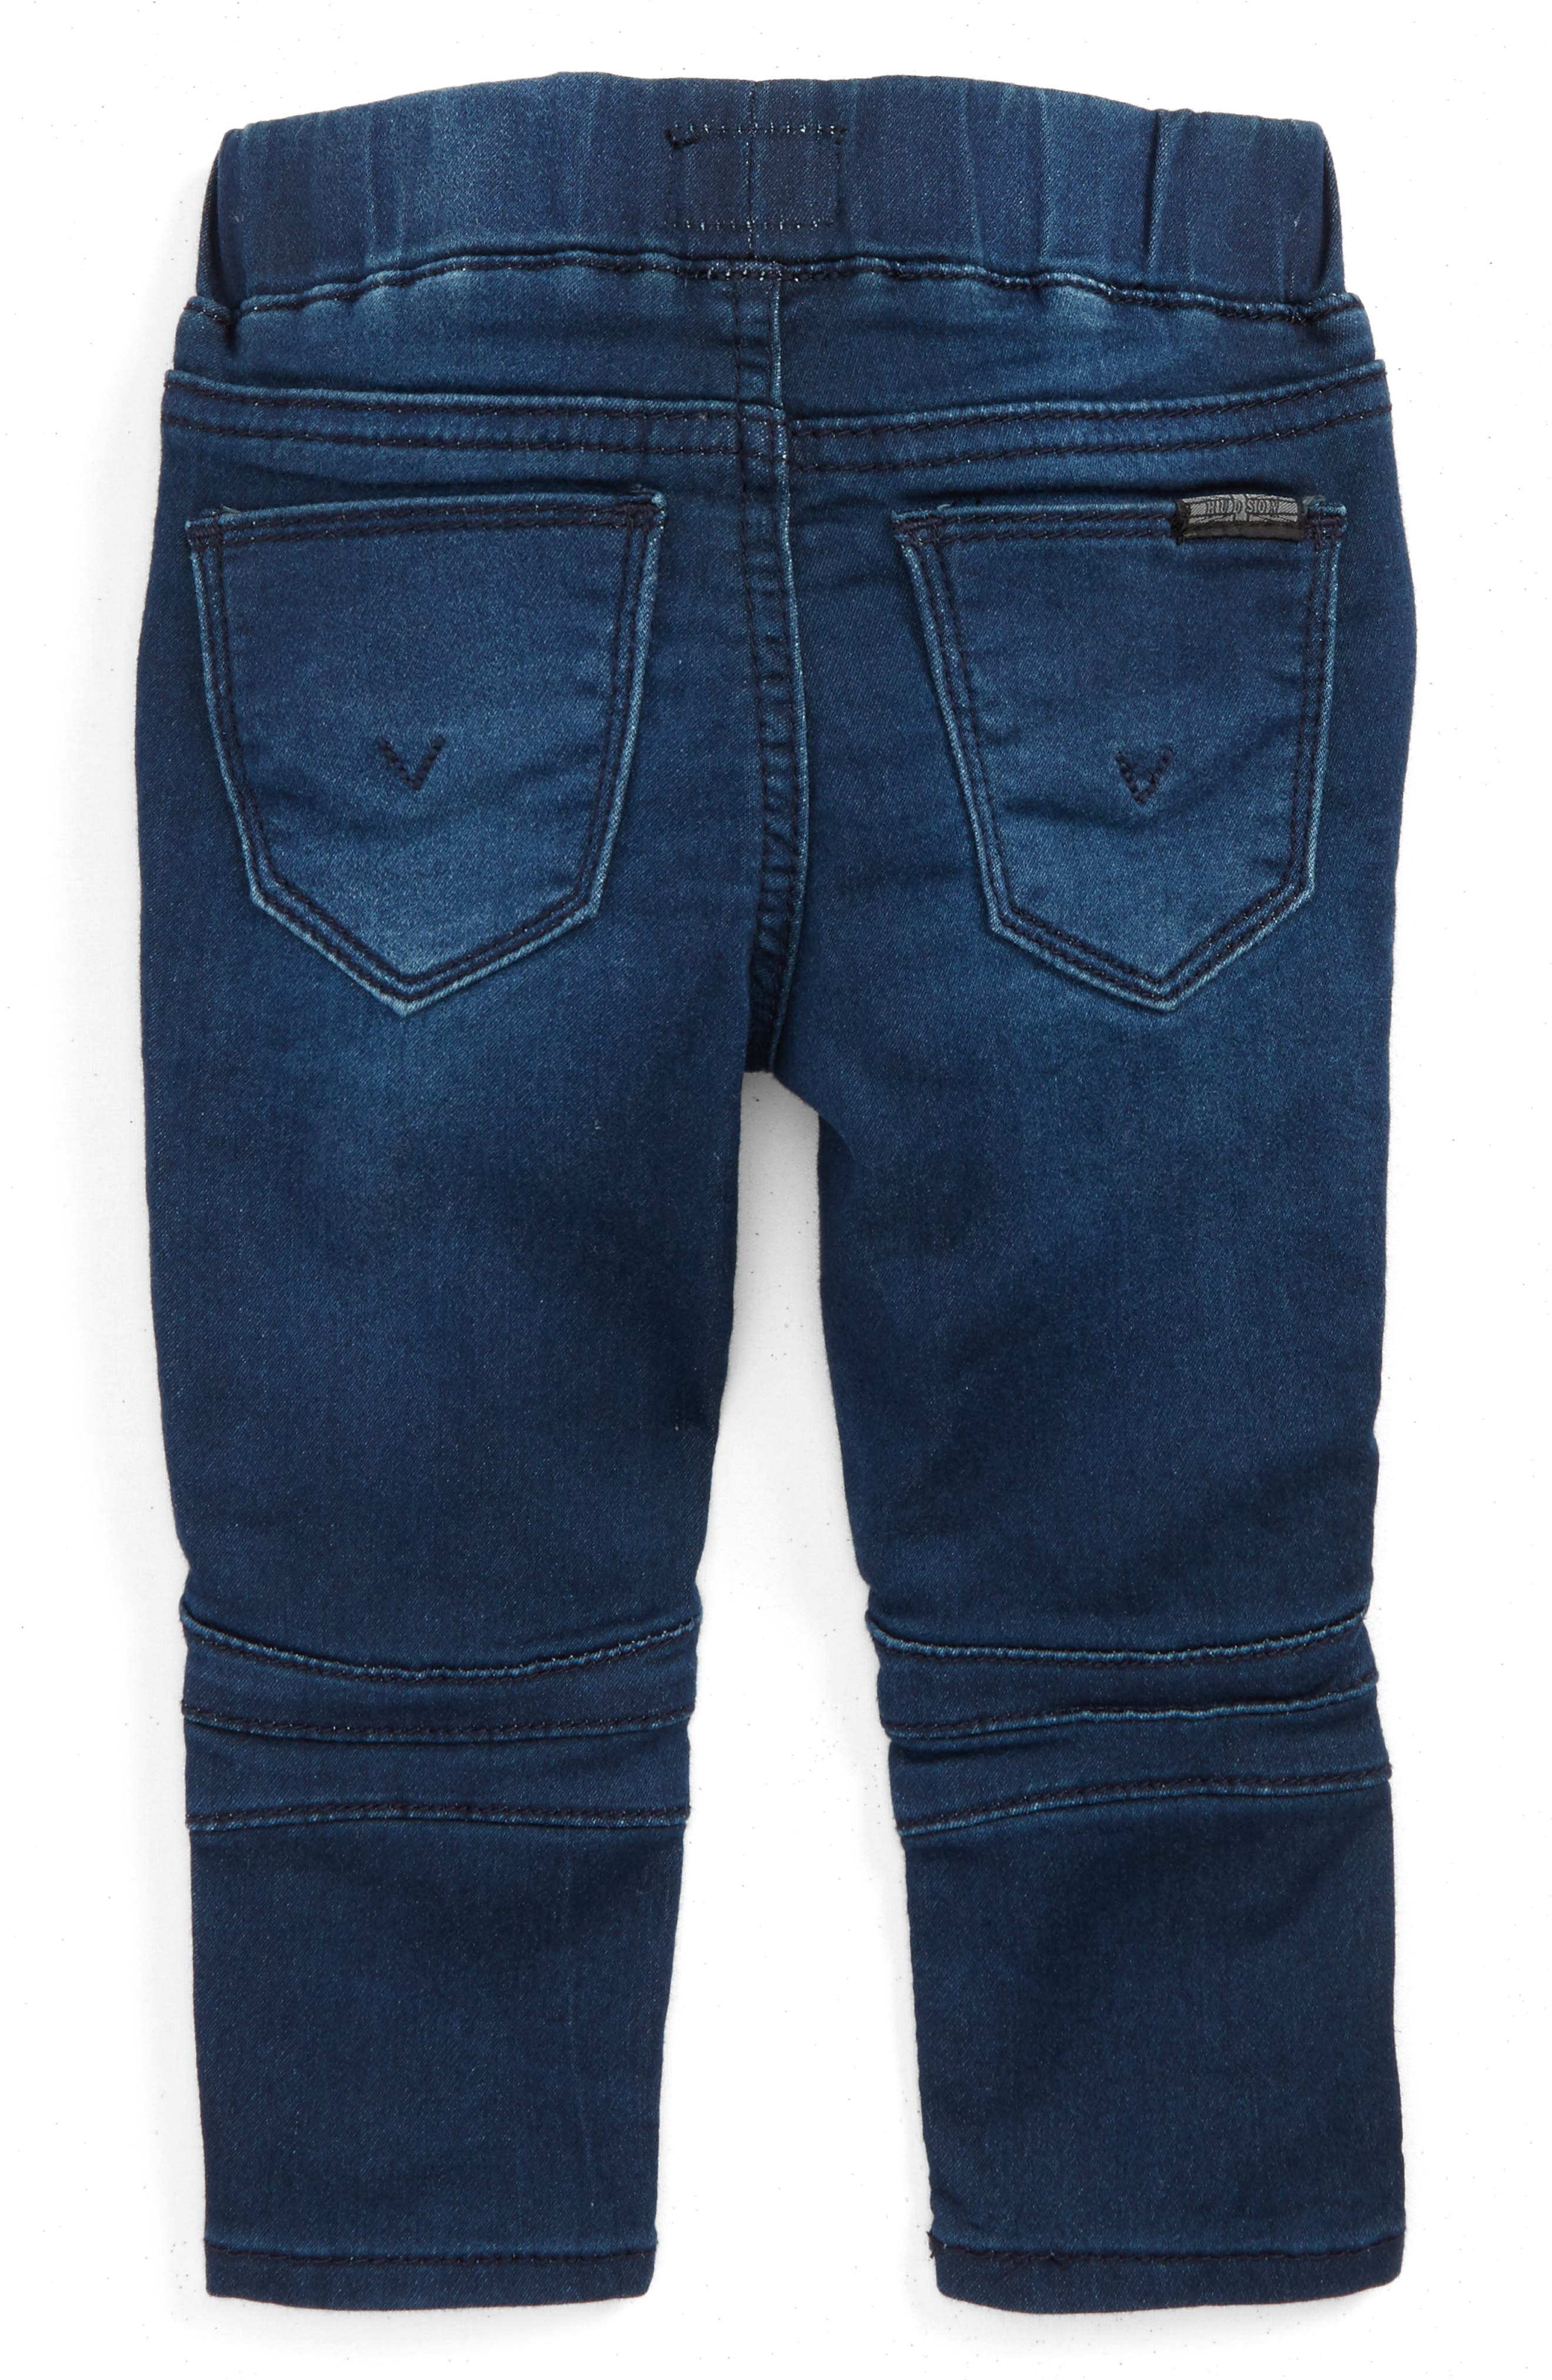 Moto Skinny Jeans,                             Alternate thumbnail 2, color,                             476